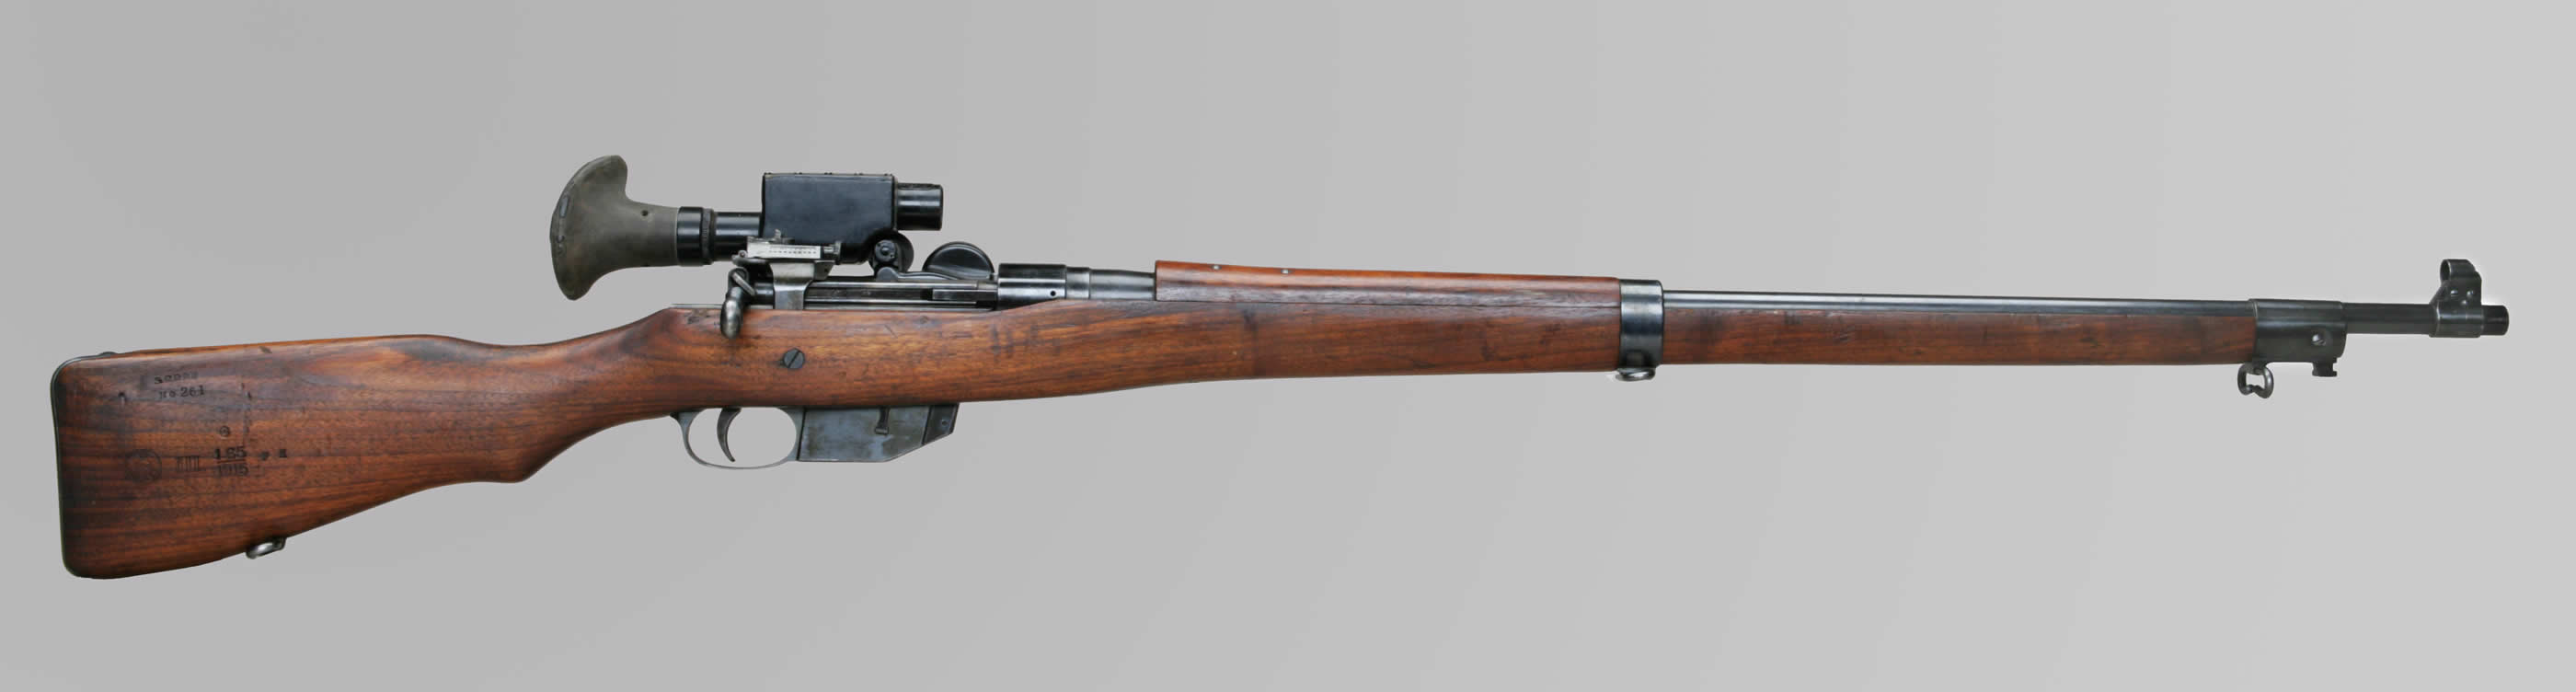 Fusil Ross, Sniper MK III